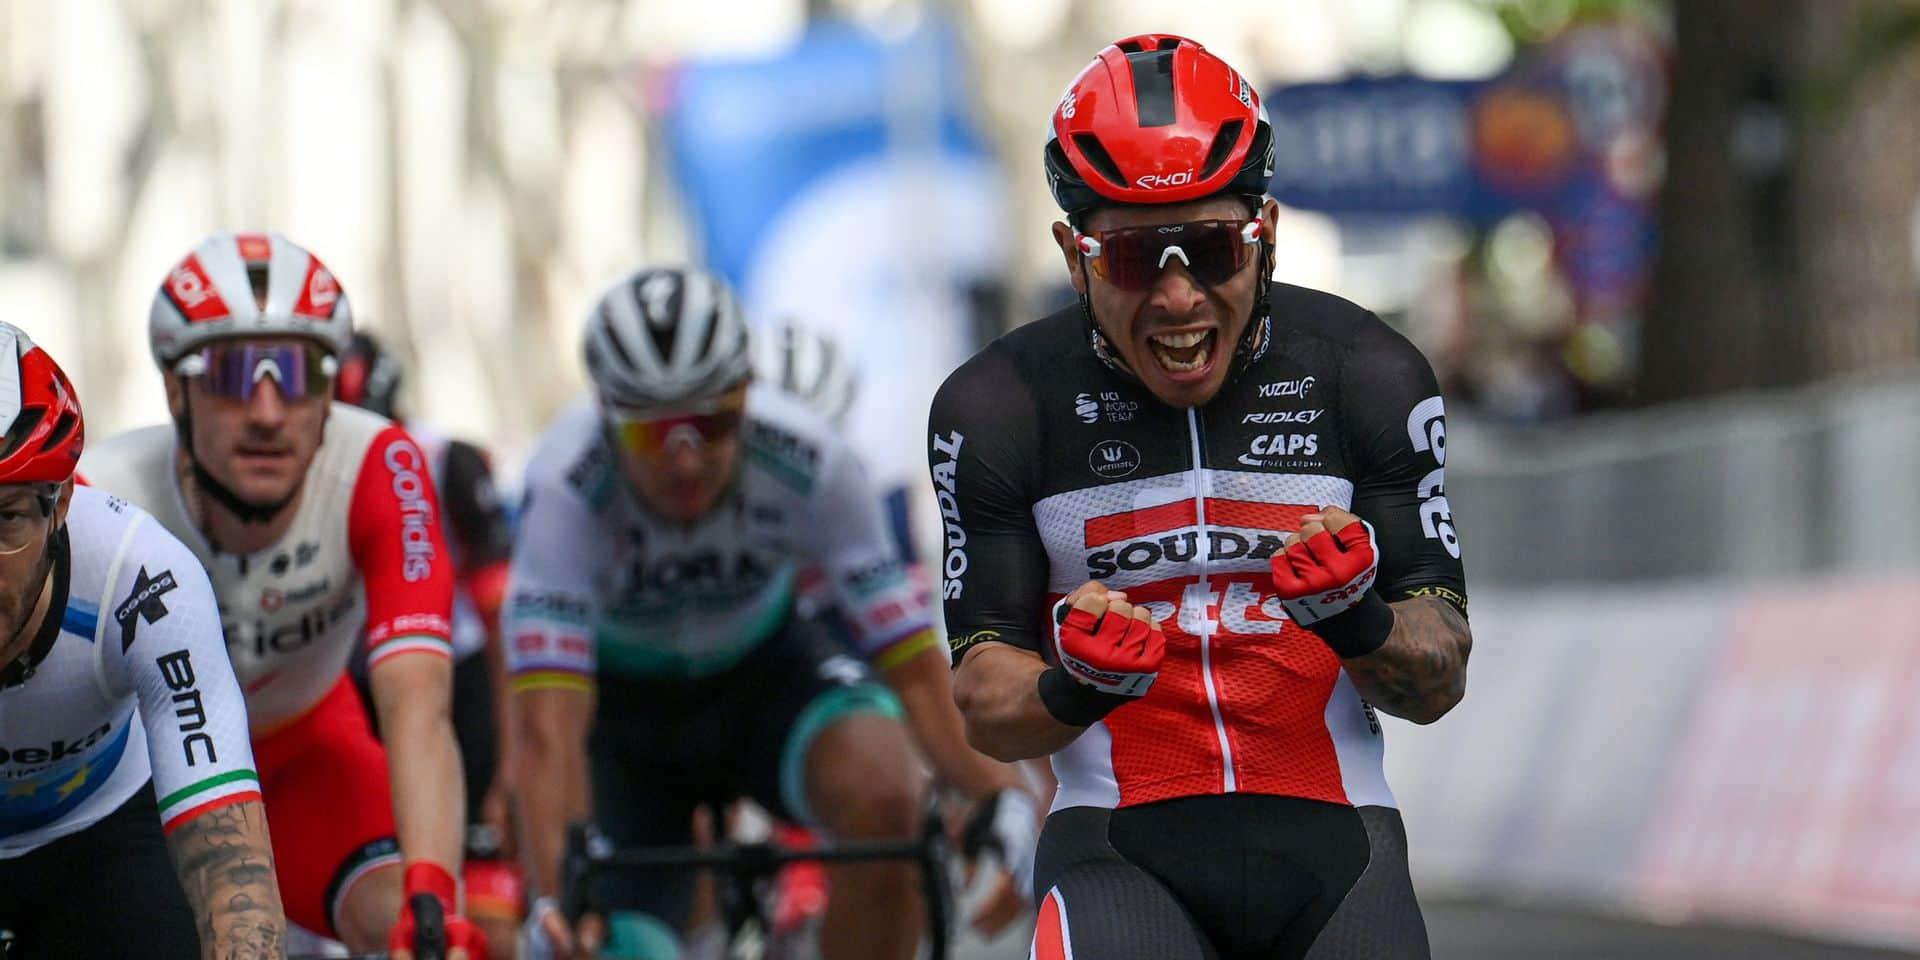 Giro d'Italia 2021 - edizione 104 - Tappa 5 - Da Modena a Cattolica